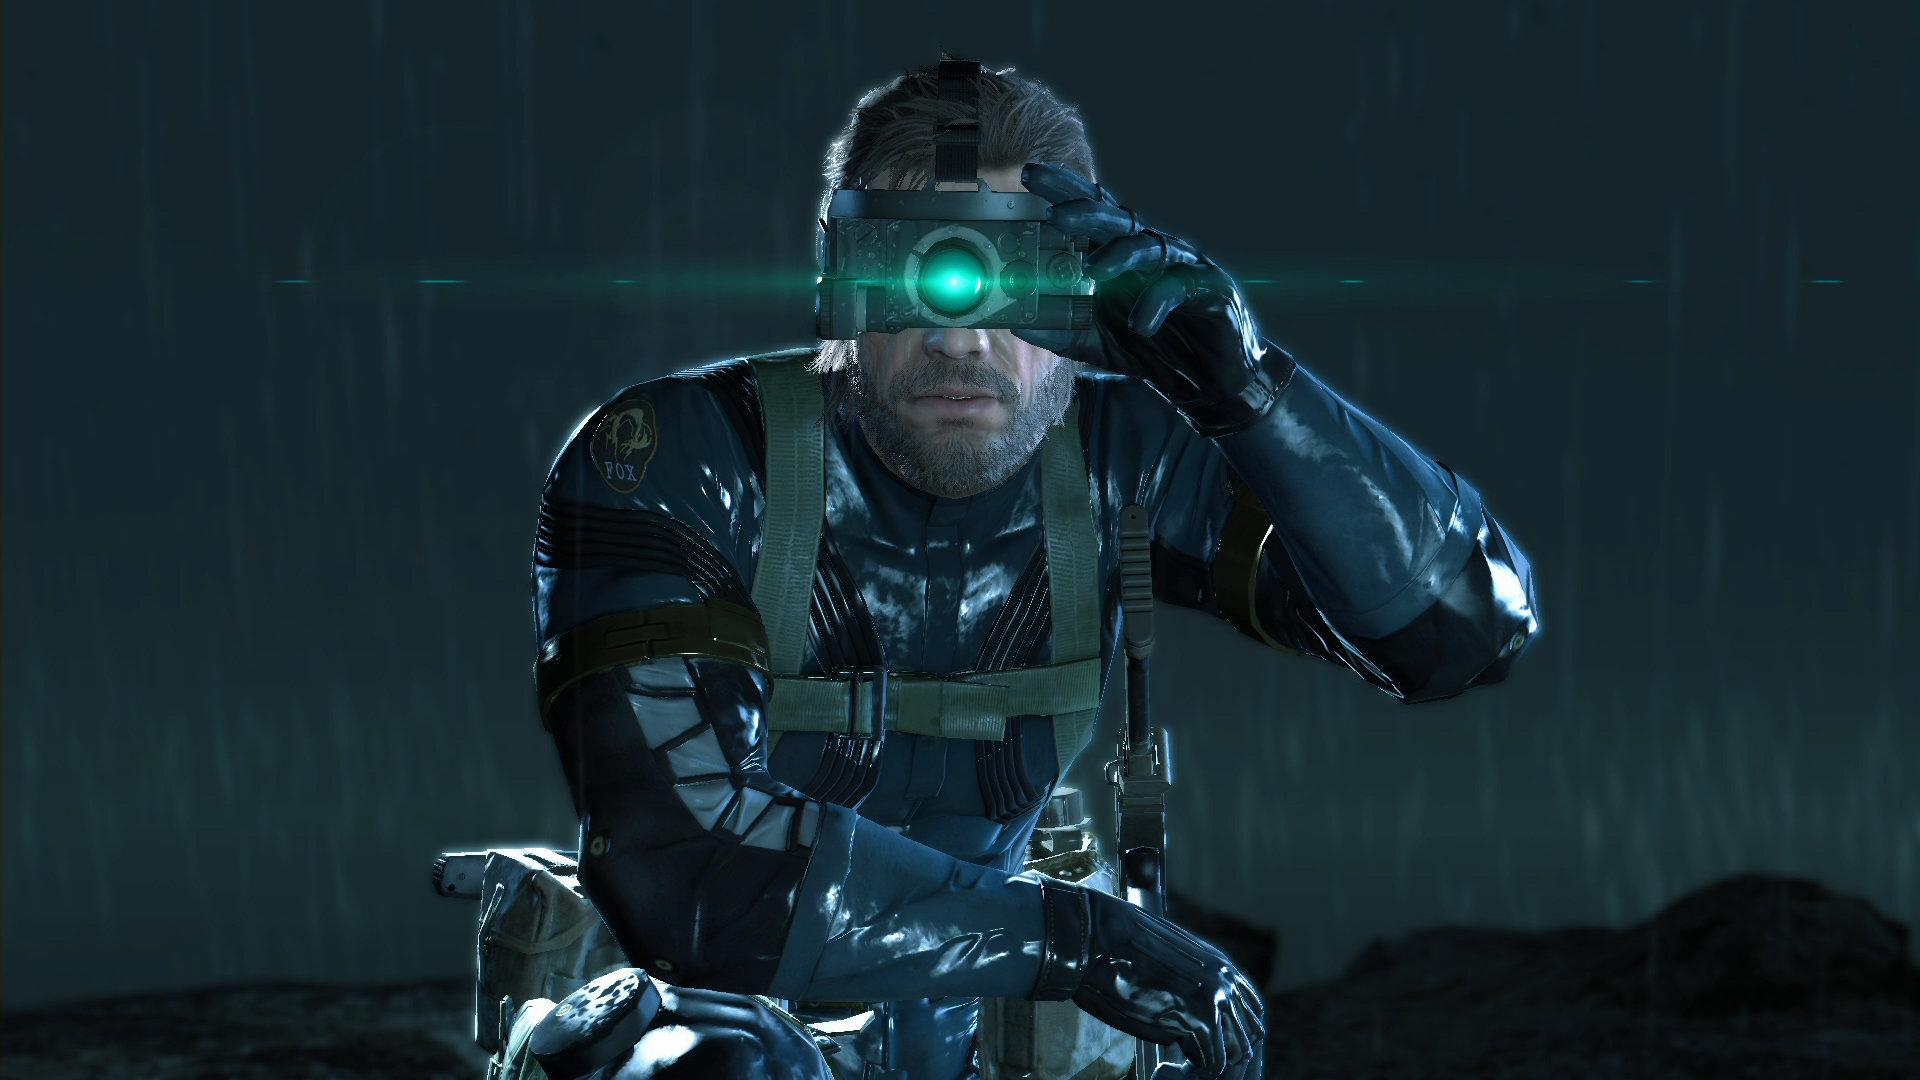 Awesome Metal Gear Solid 5 V The Phantom Pain Mgsv 5 Free